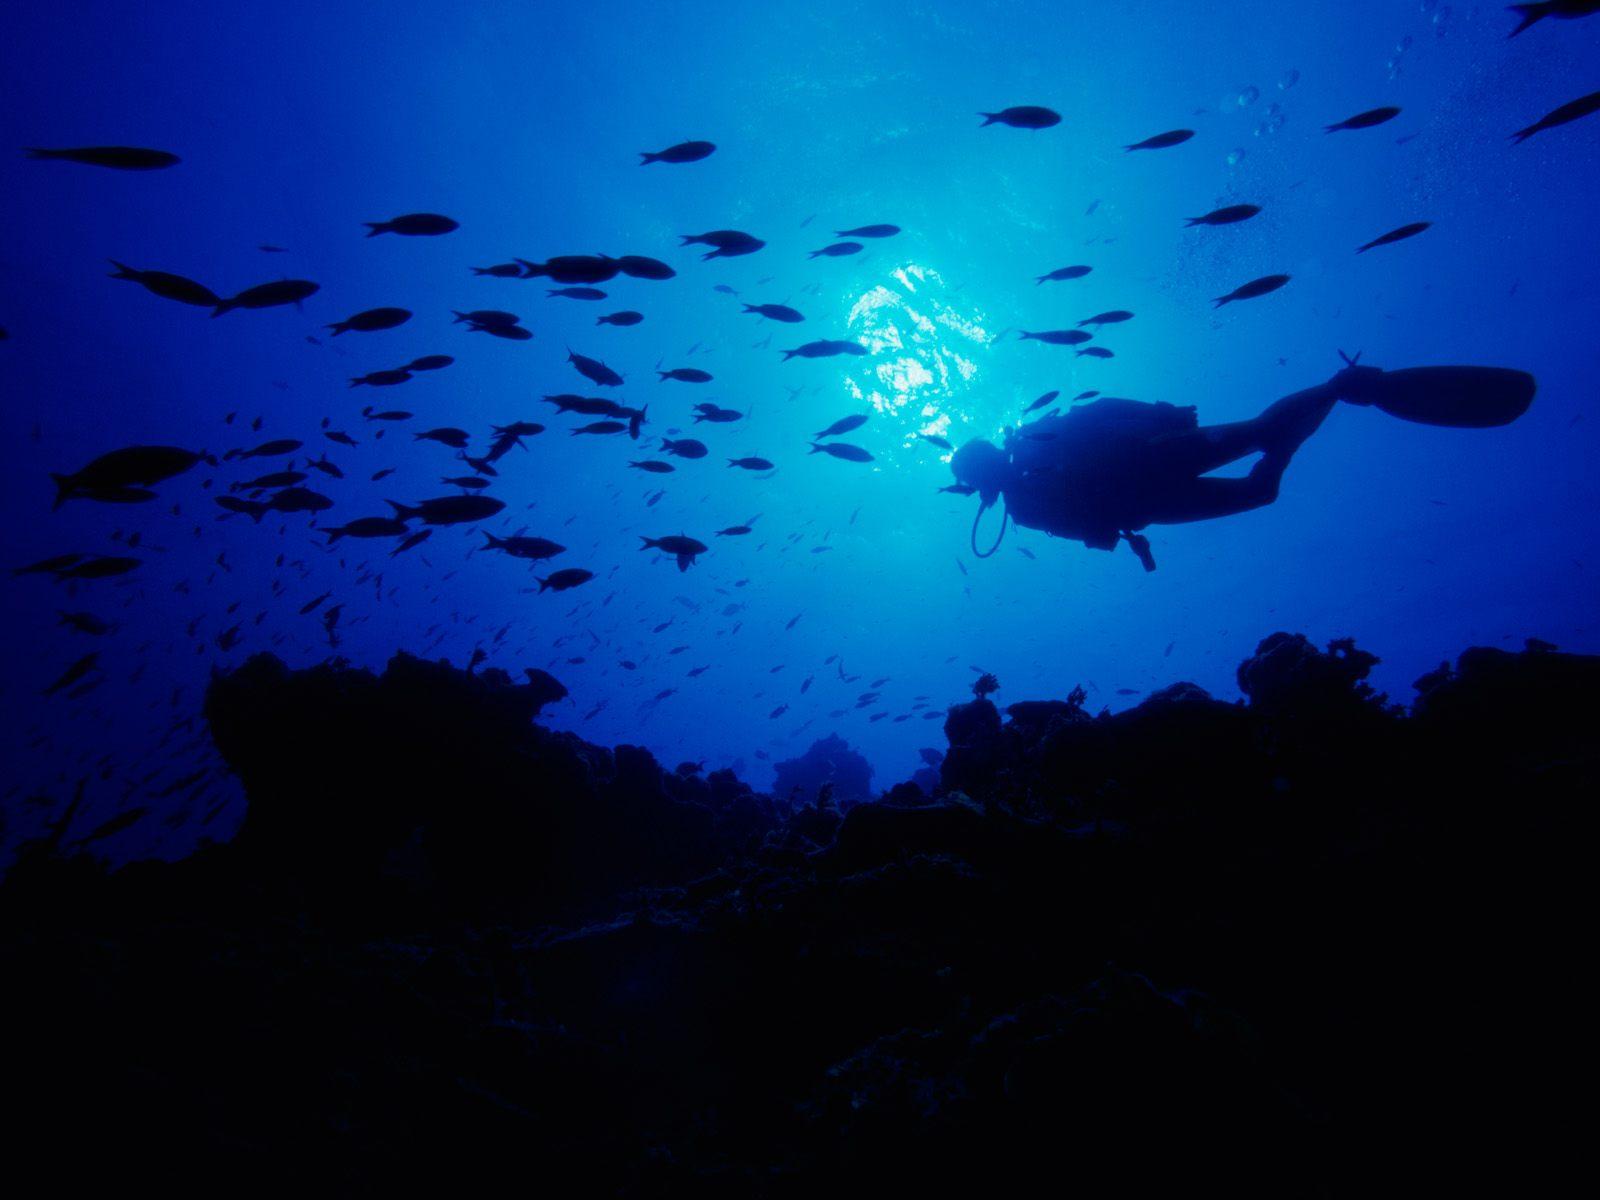 Blue Ocean Fish Animal HD Wallpaper Blue Ocean Fish Animal HD 1600x1200